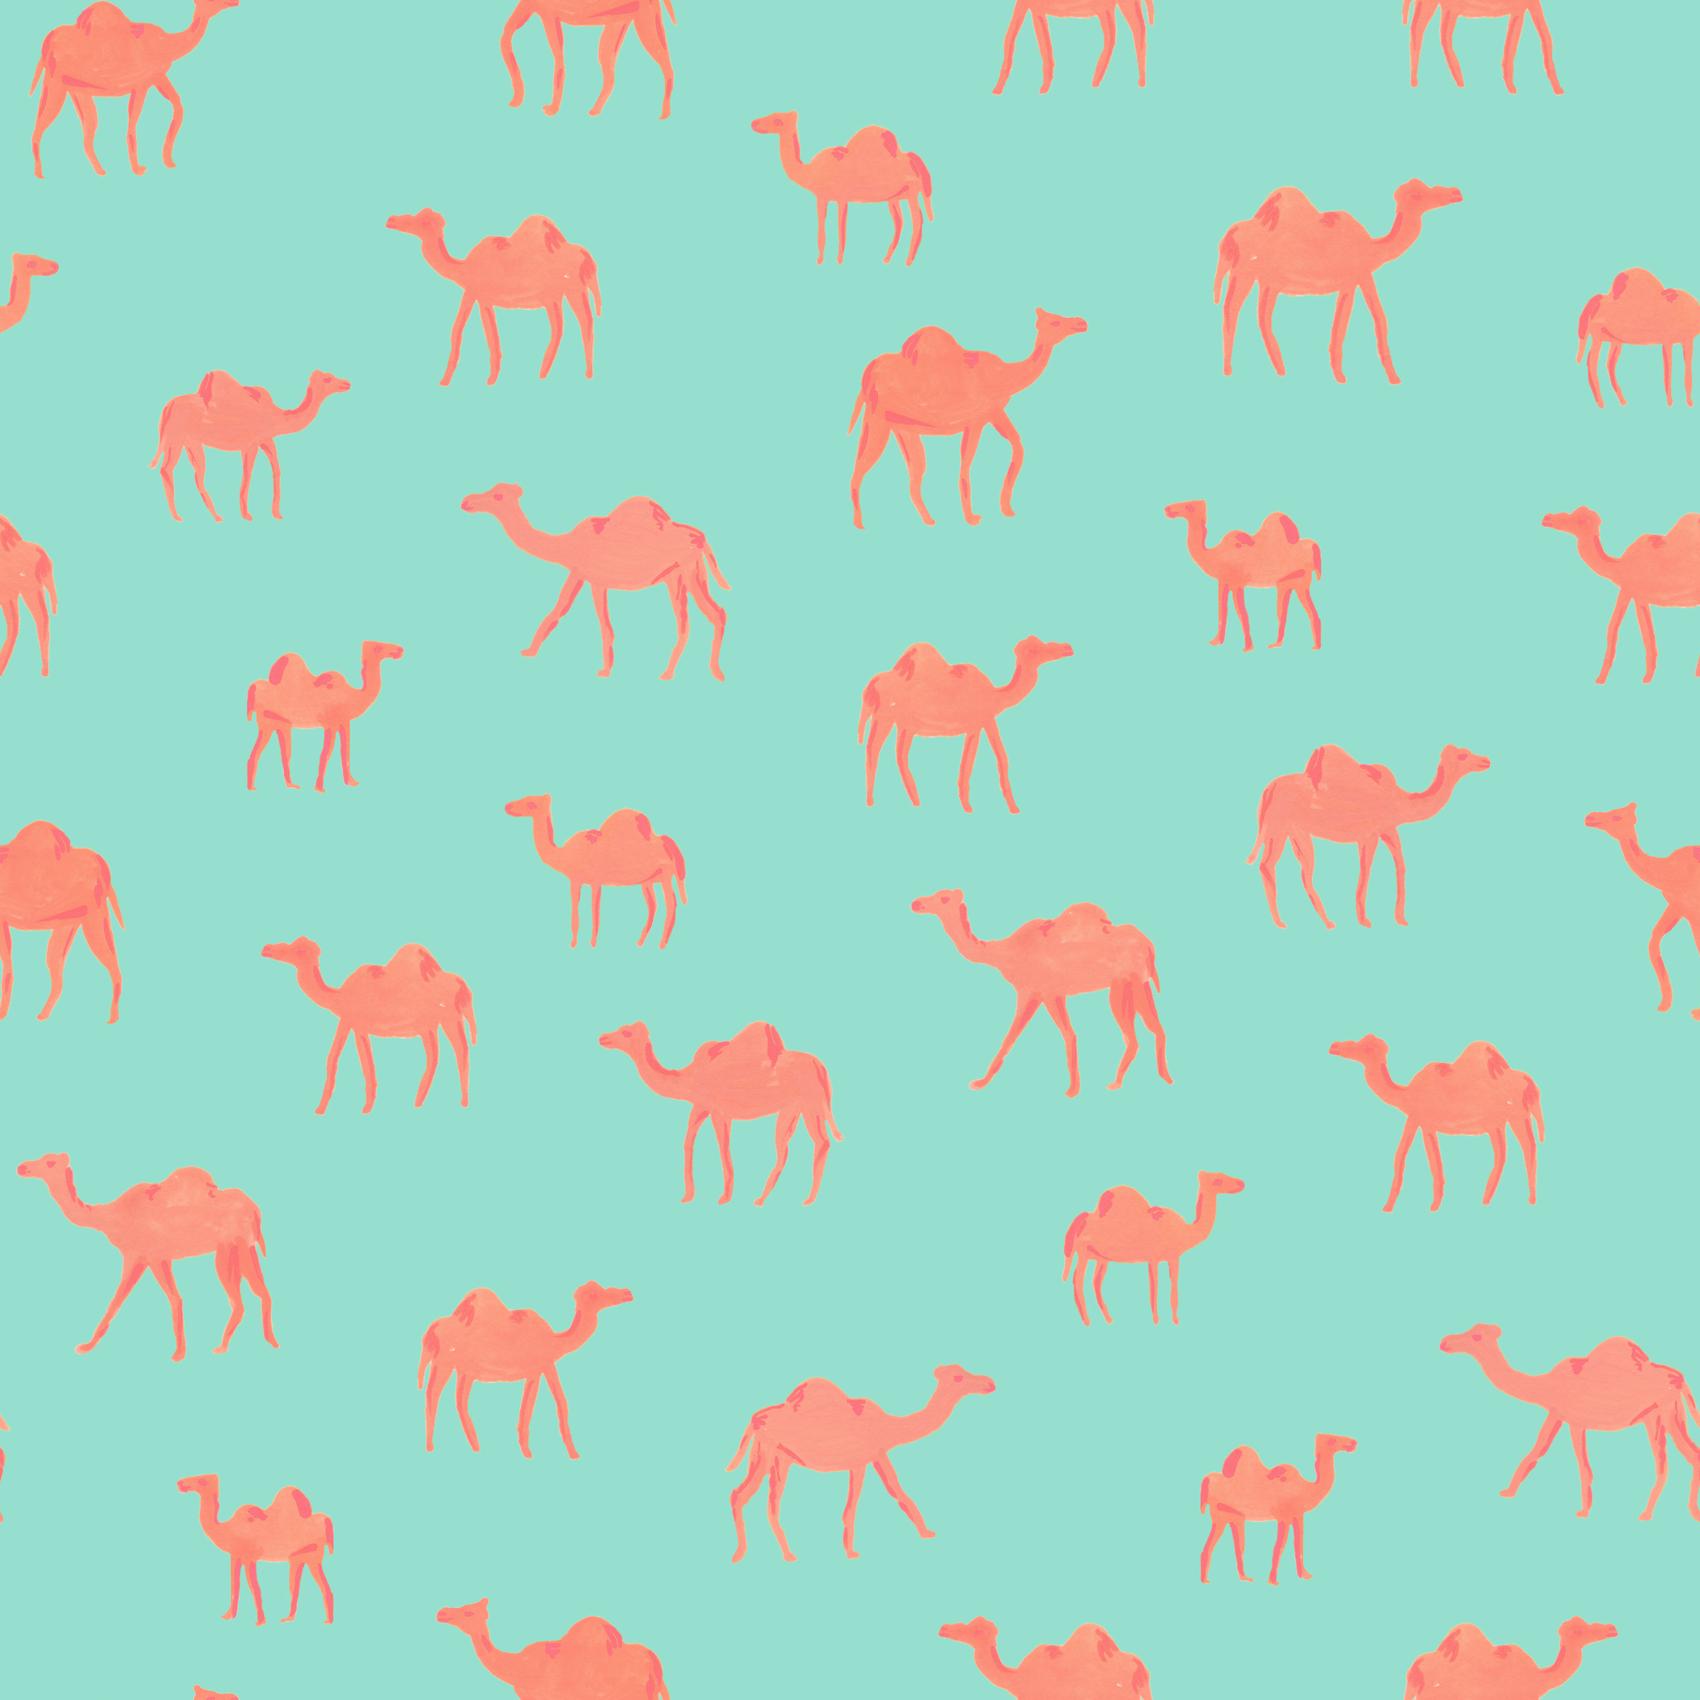 Skye McNeill_Camels